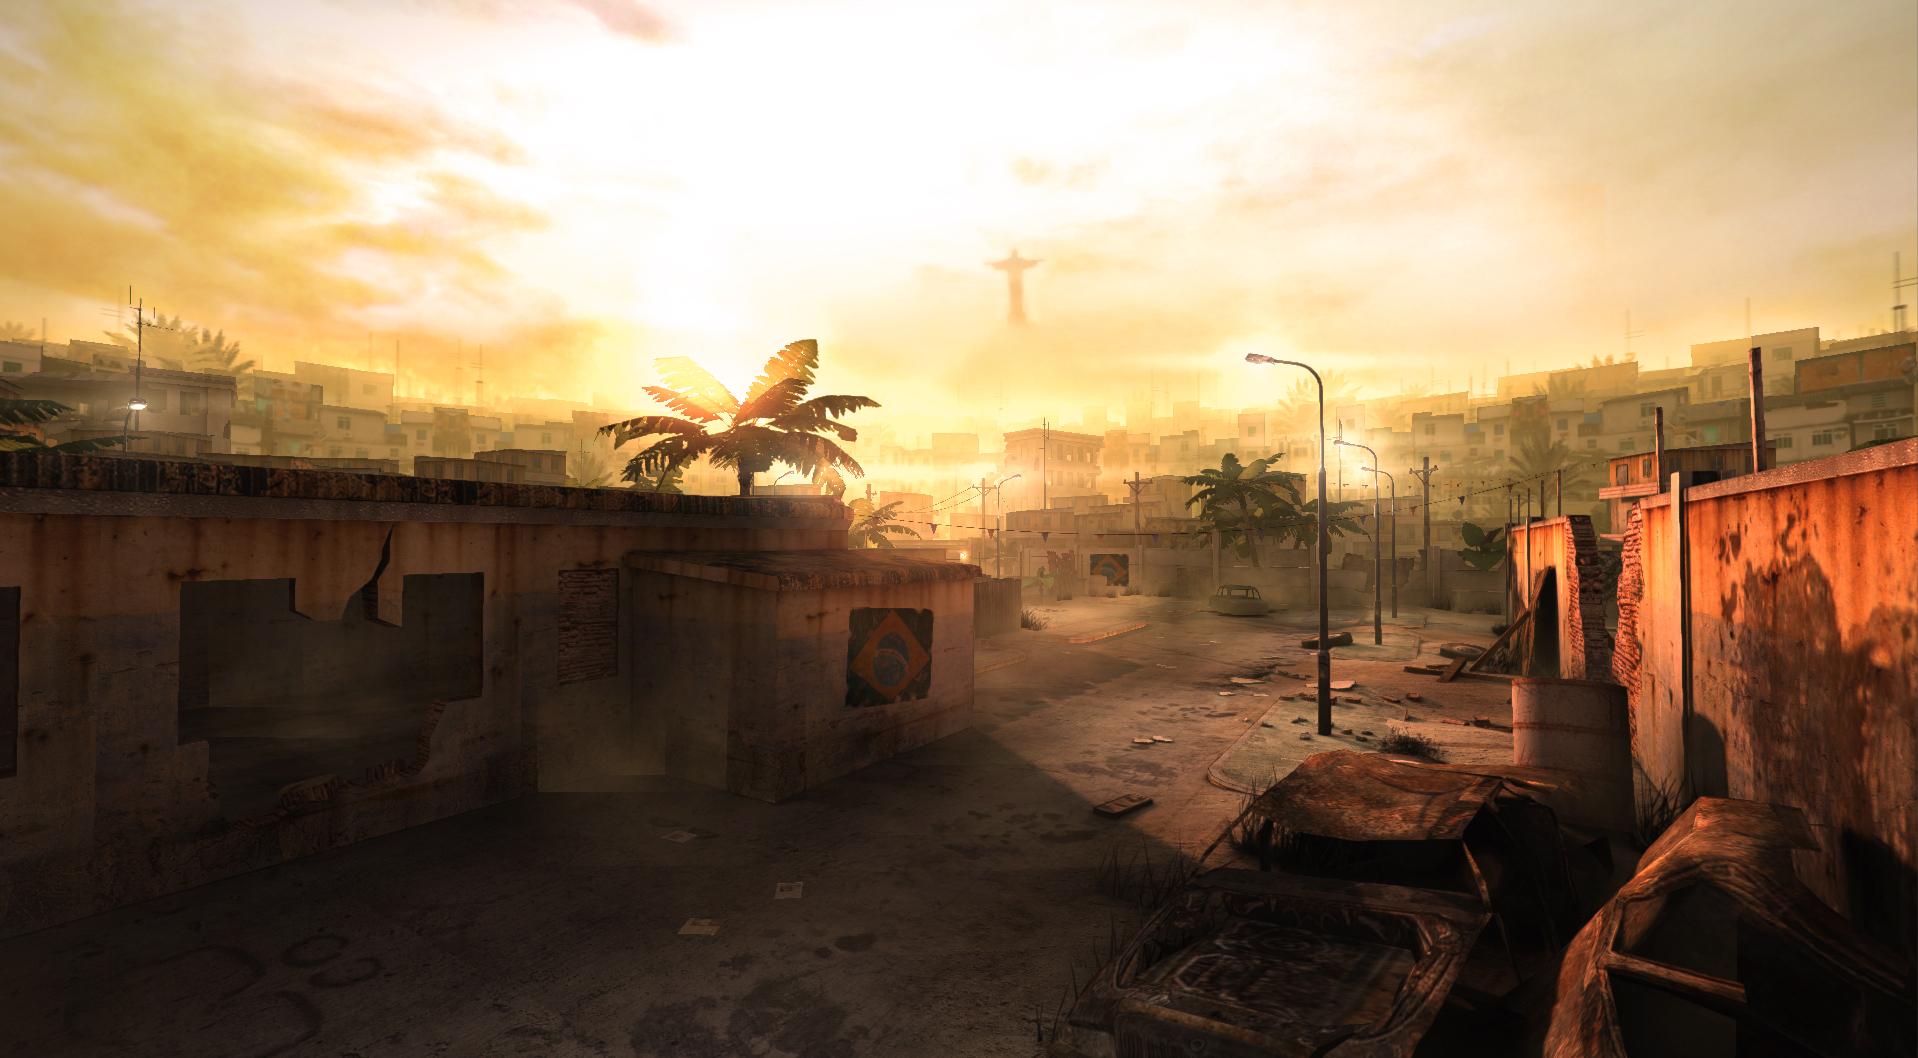 XFP2_Favelas07.jpg